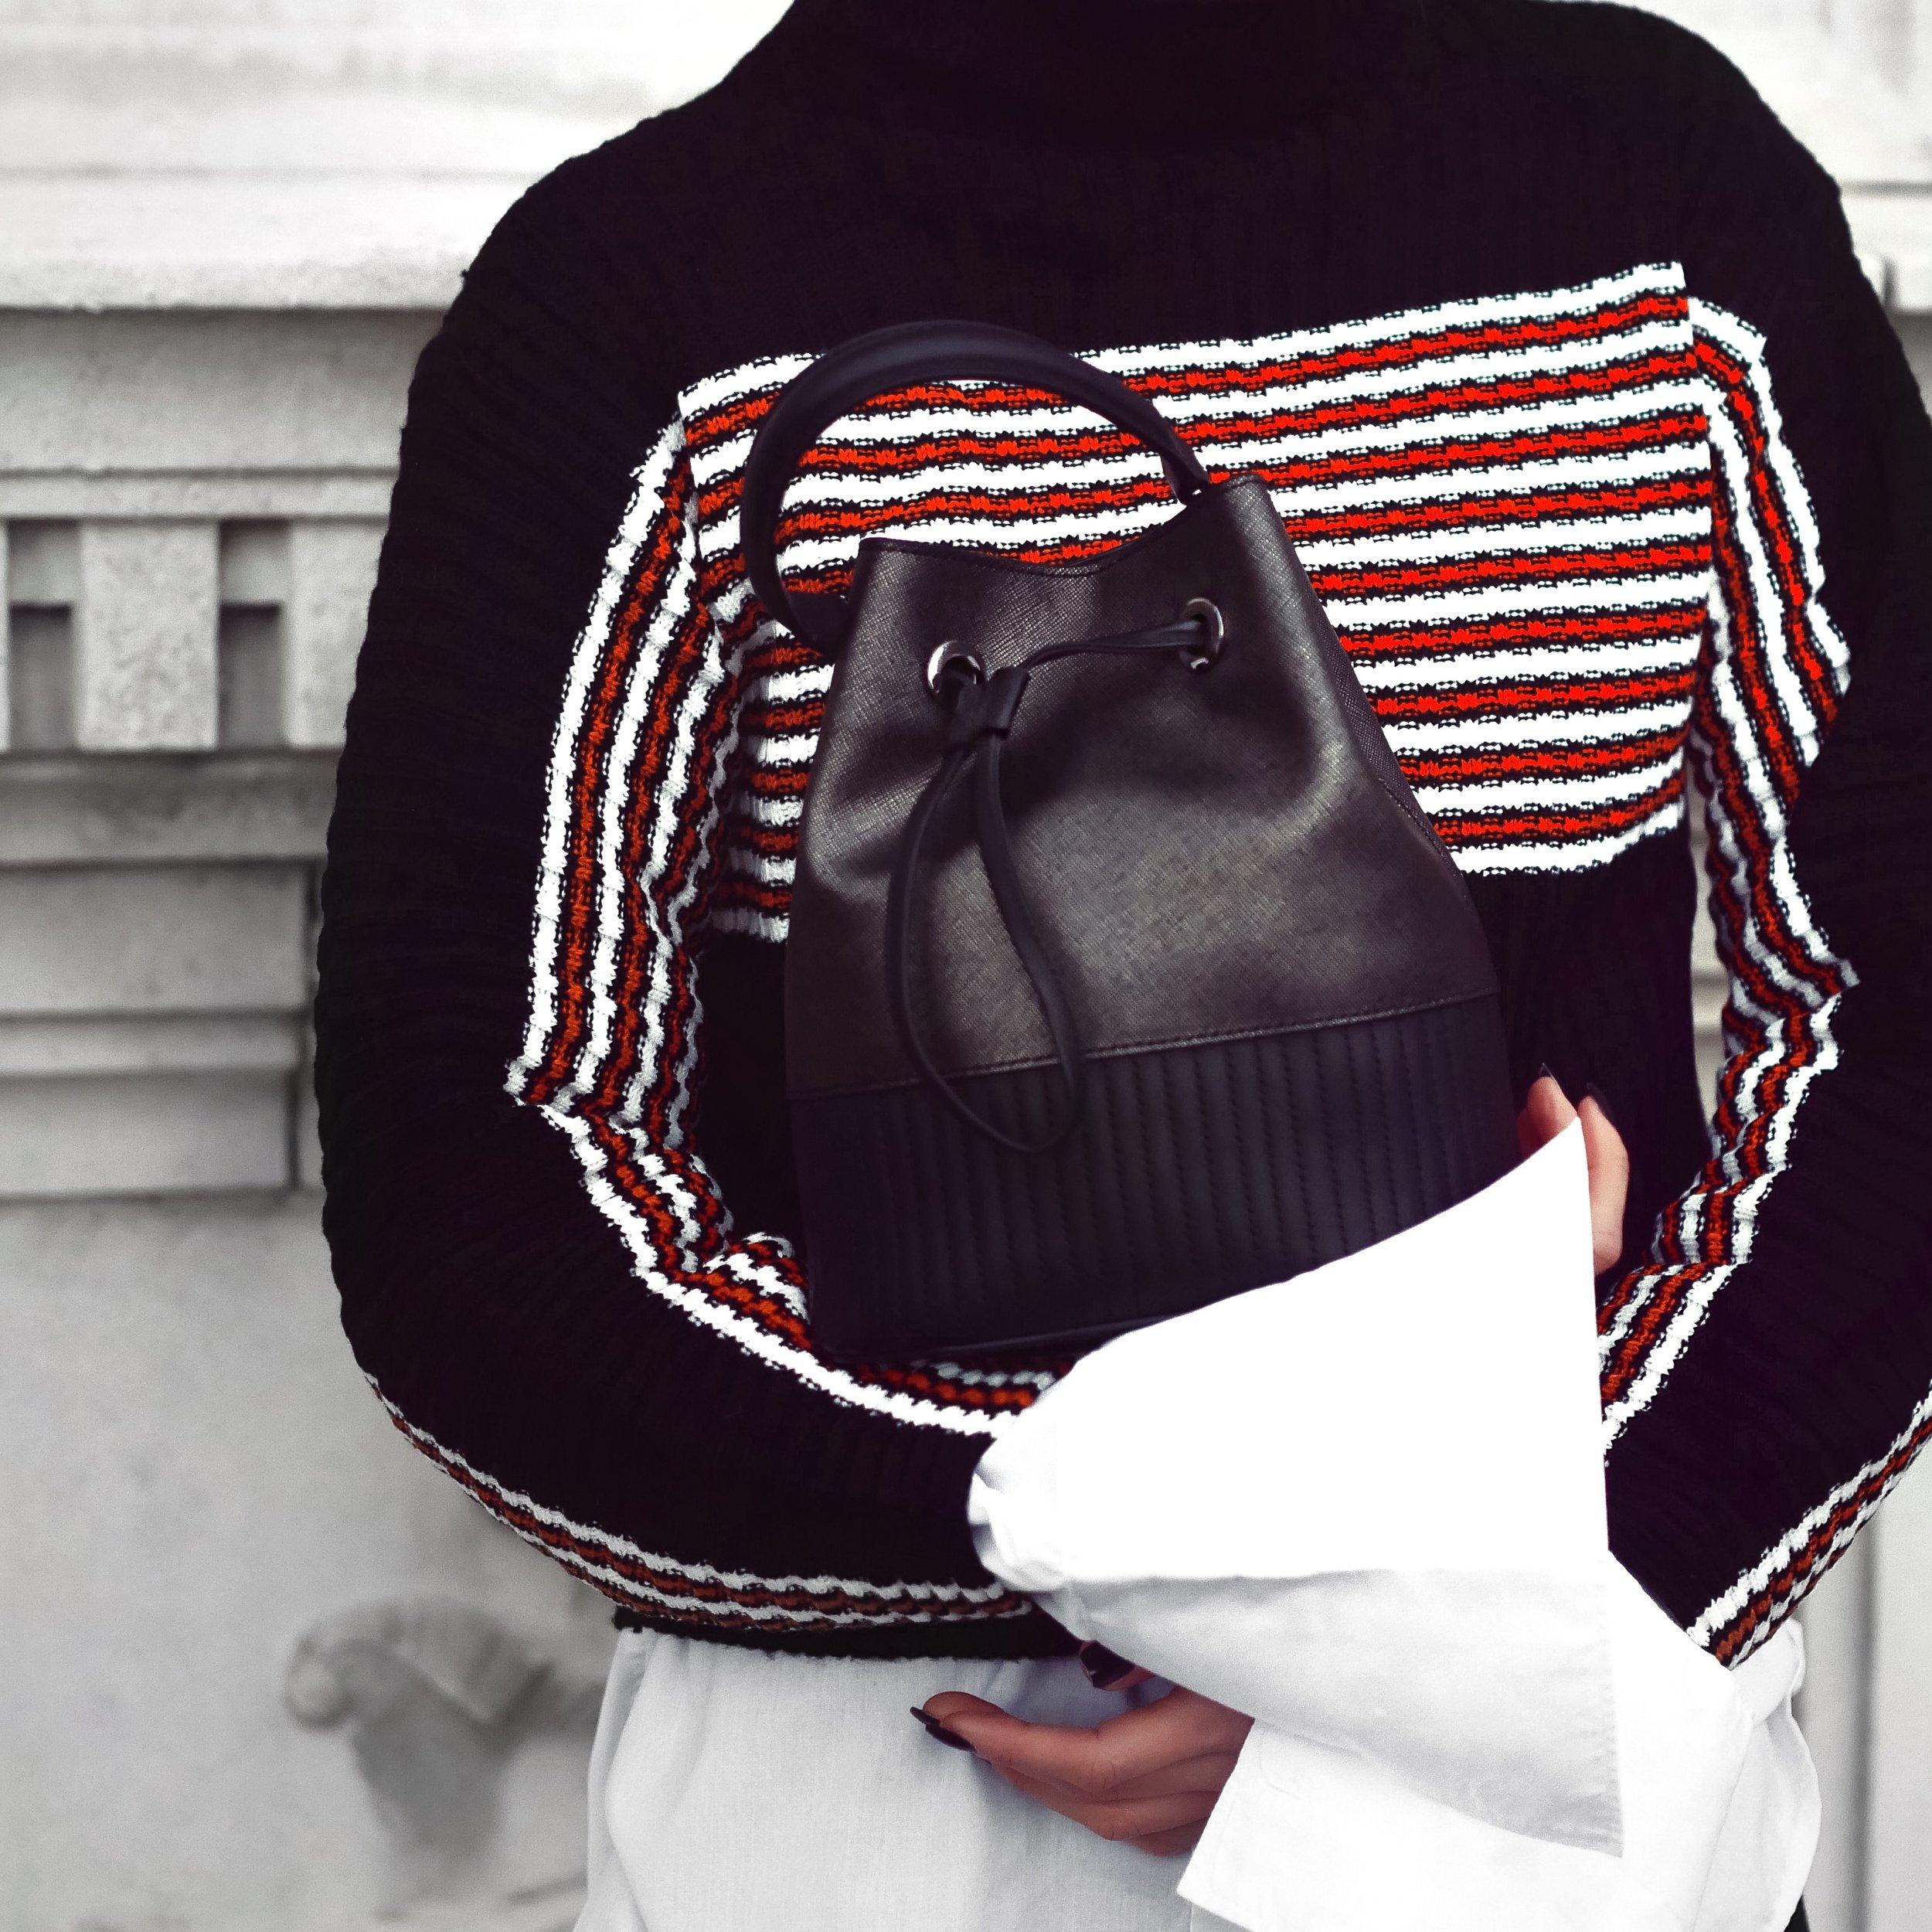 boohoo, affordable fashion, strretstyle, inspiration, what to wear, fashion, lookbook, style, fashion blogger, laura blair, youtuber, london fashion girl